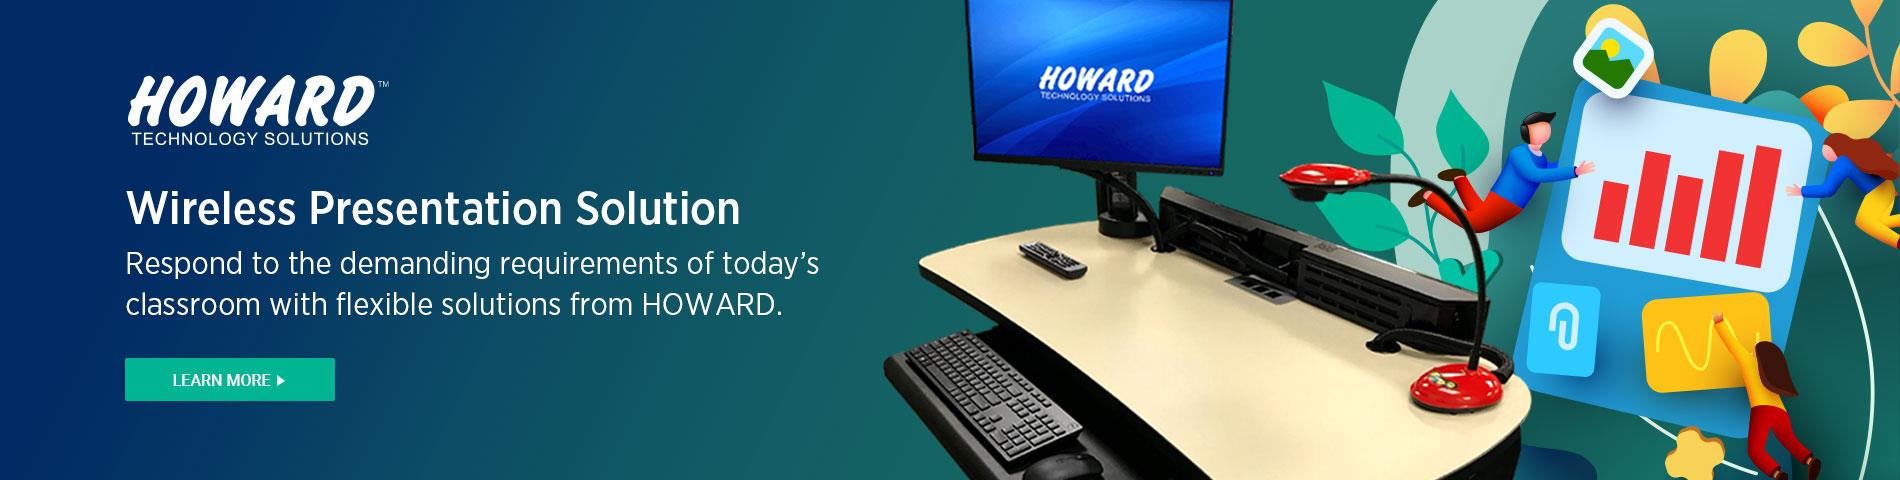 Howard Wireless Presenter Solution